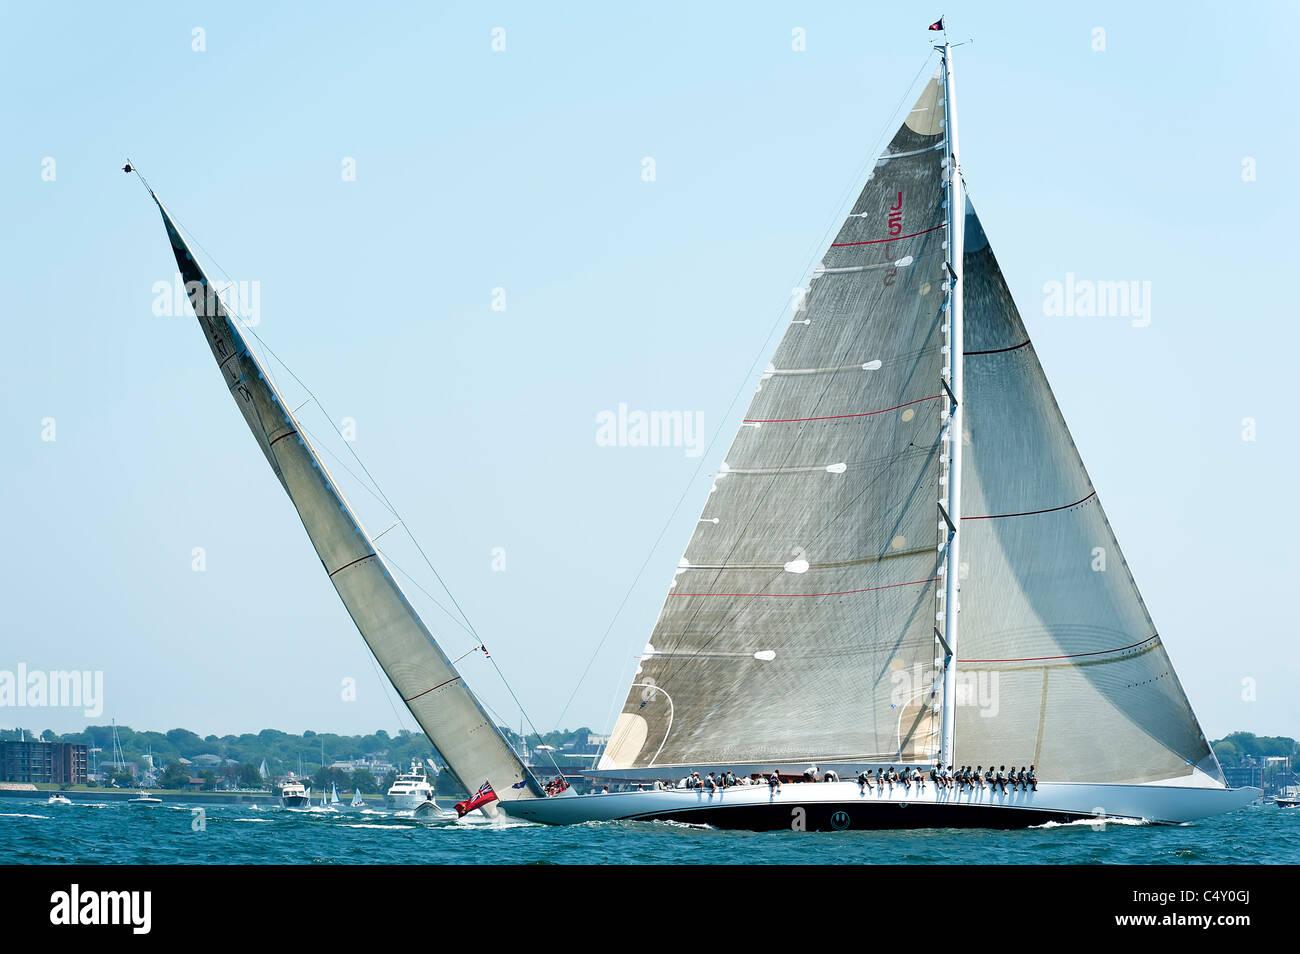 j class yachts racing Stock Photo